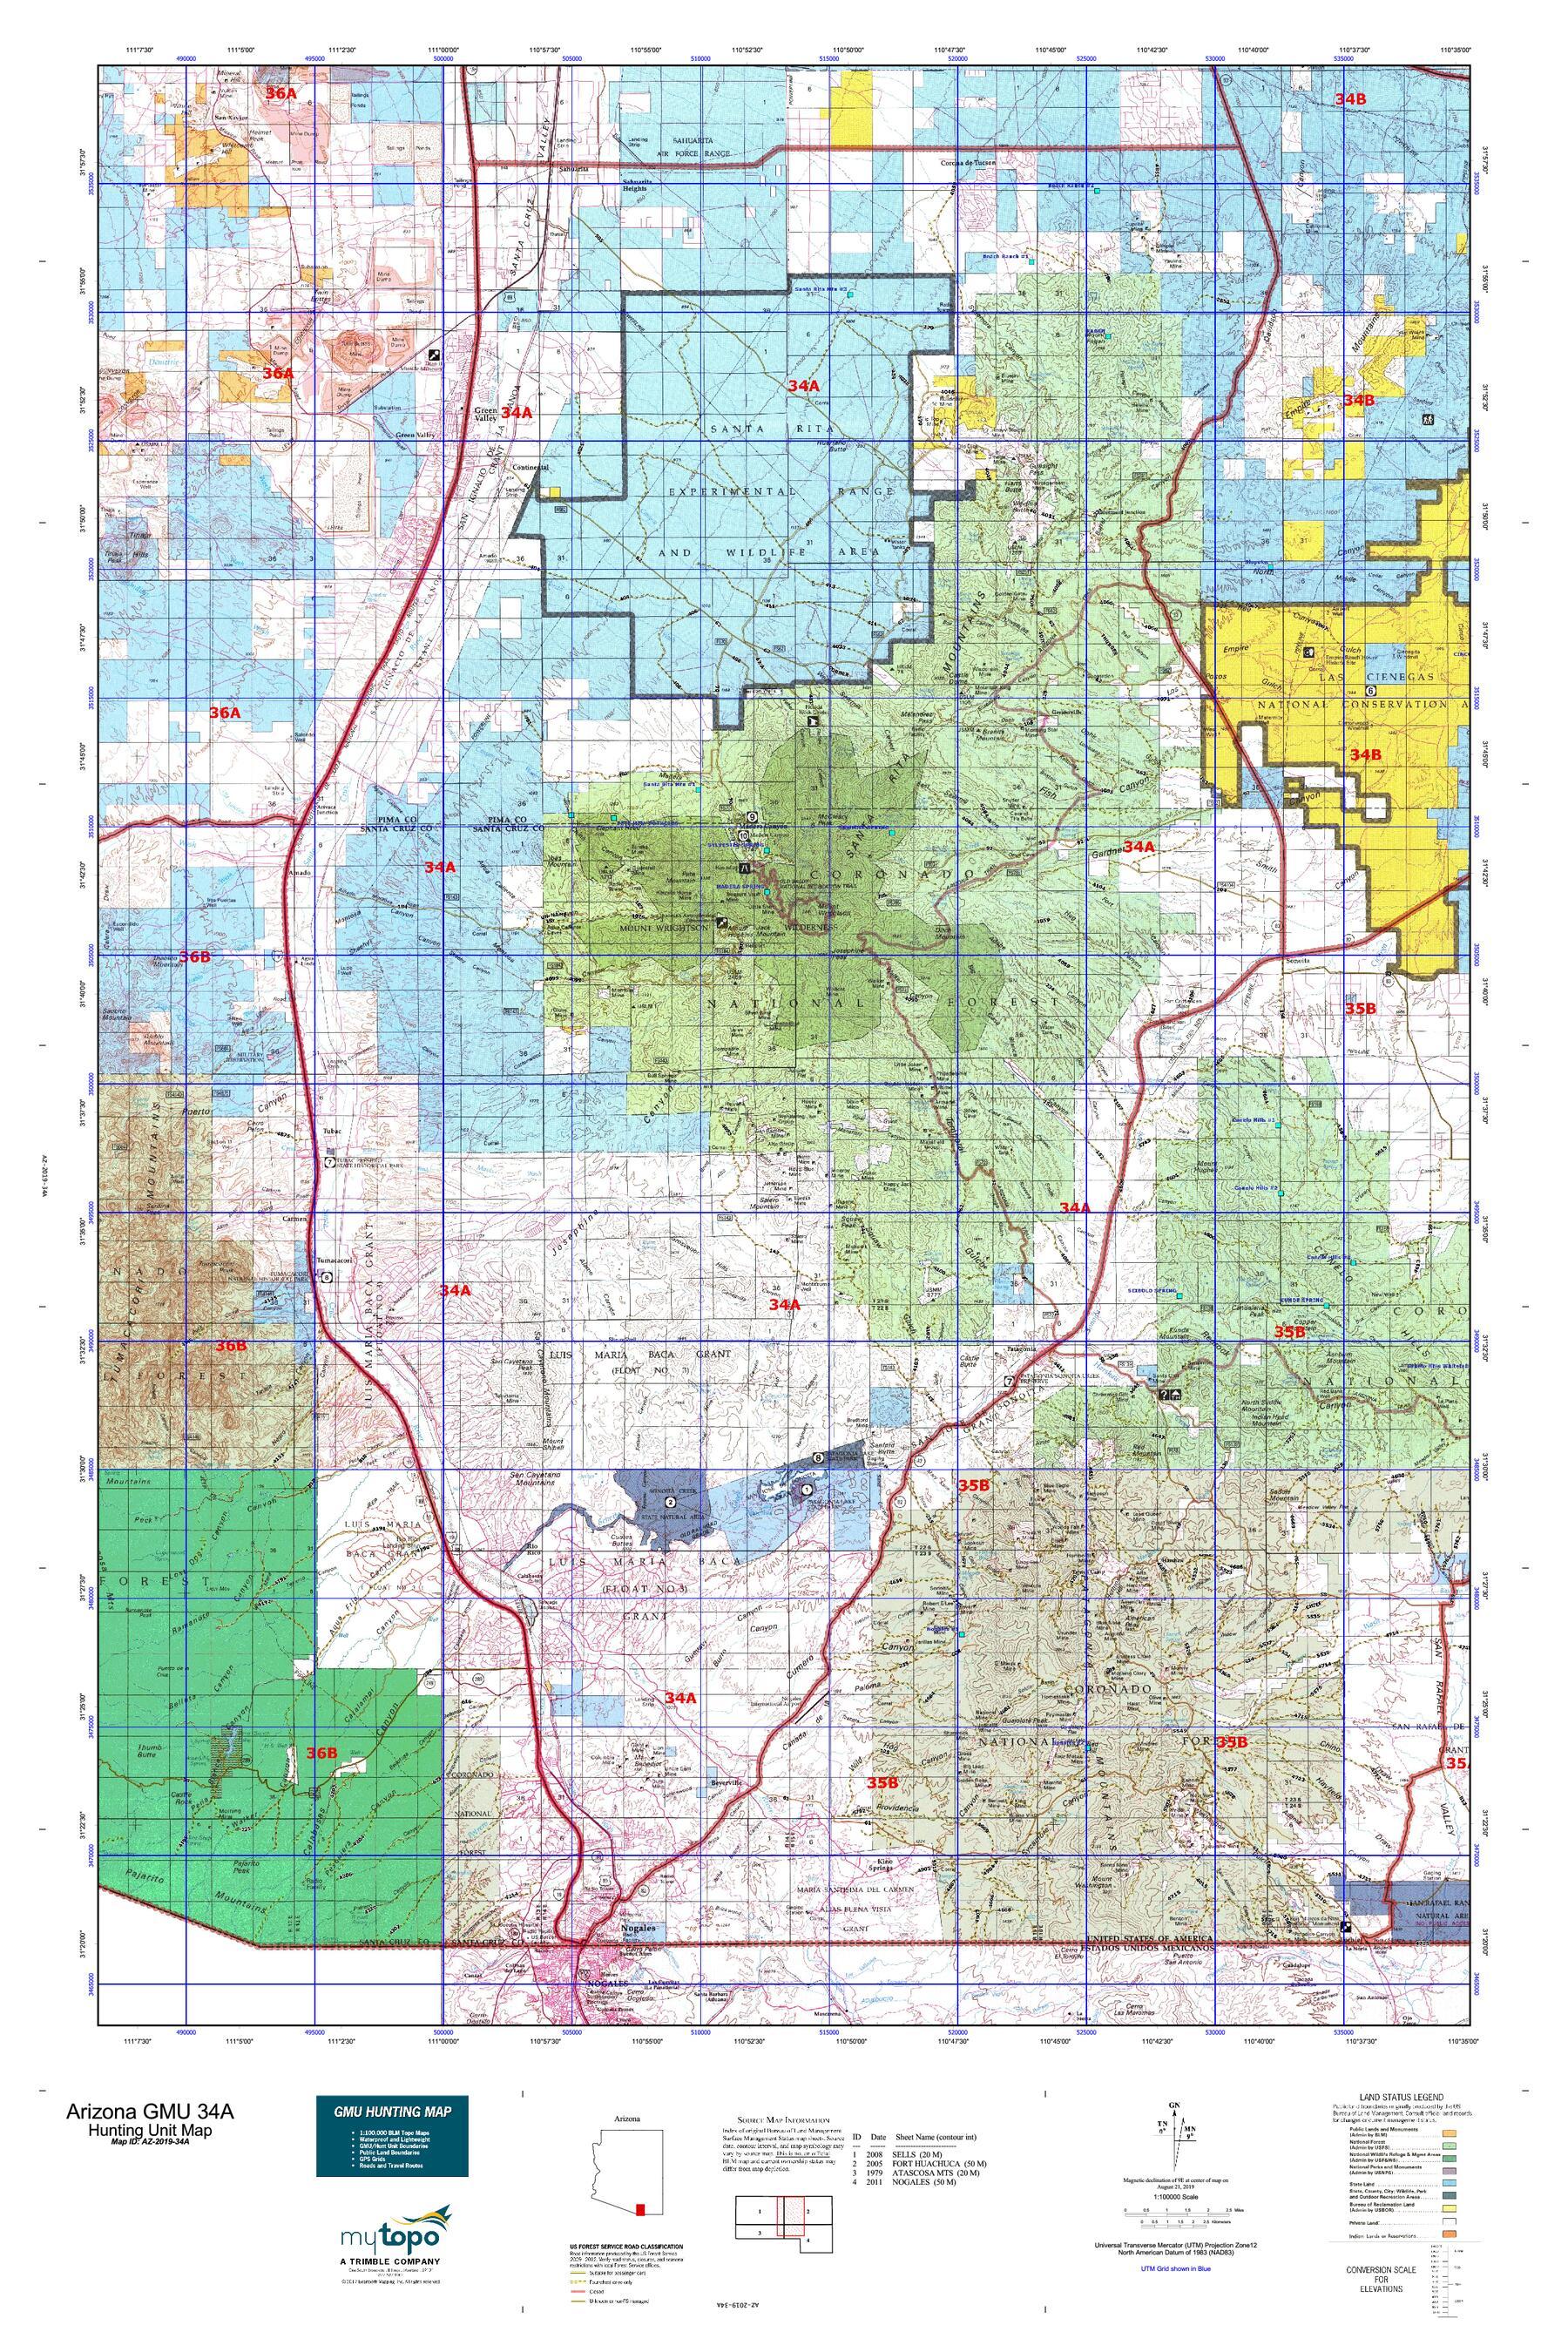 Arizona GMU 34A Map | MyTopo on nc map, ms map, ks map, mo map, mn map, arizona hwy map, arizona fun map, nv map, ma map, new mexico map, southern desert map, arizona wildlife map, ut map, or map, ae map, kr map, iowa map, wy map, ok map, arizona road map,